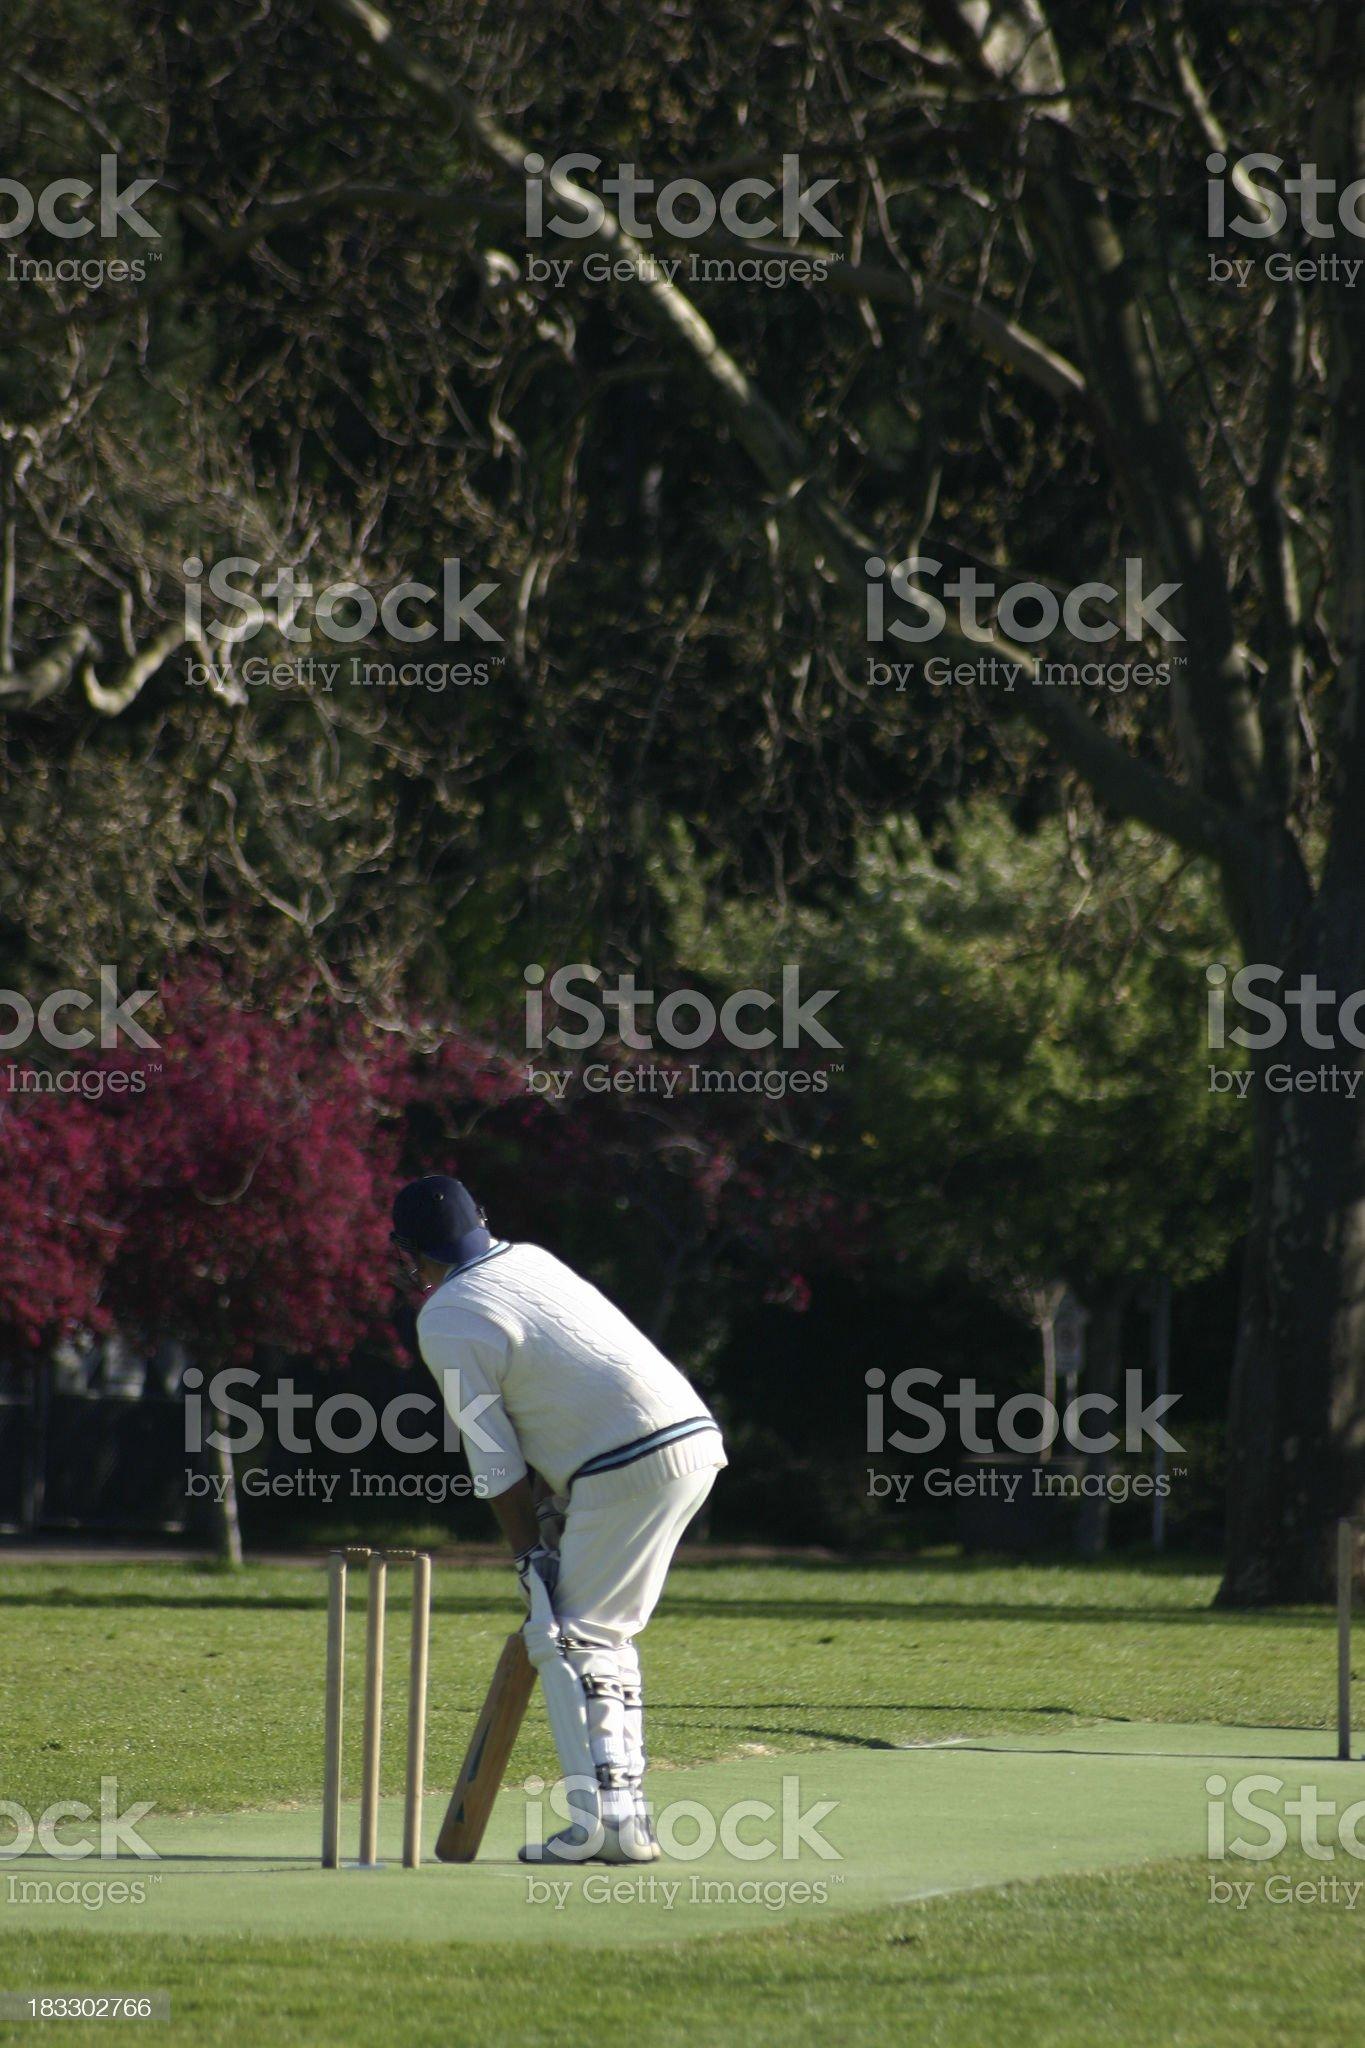 Cricket Match royalty-free stock photo